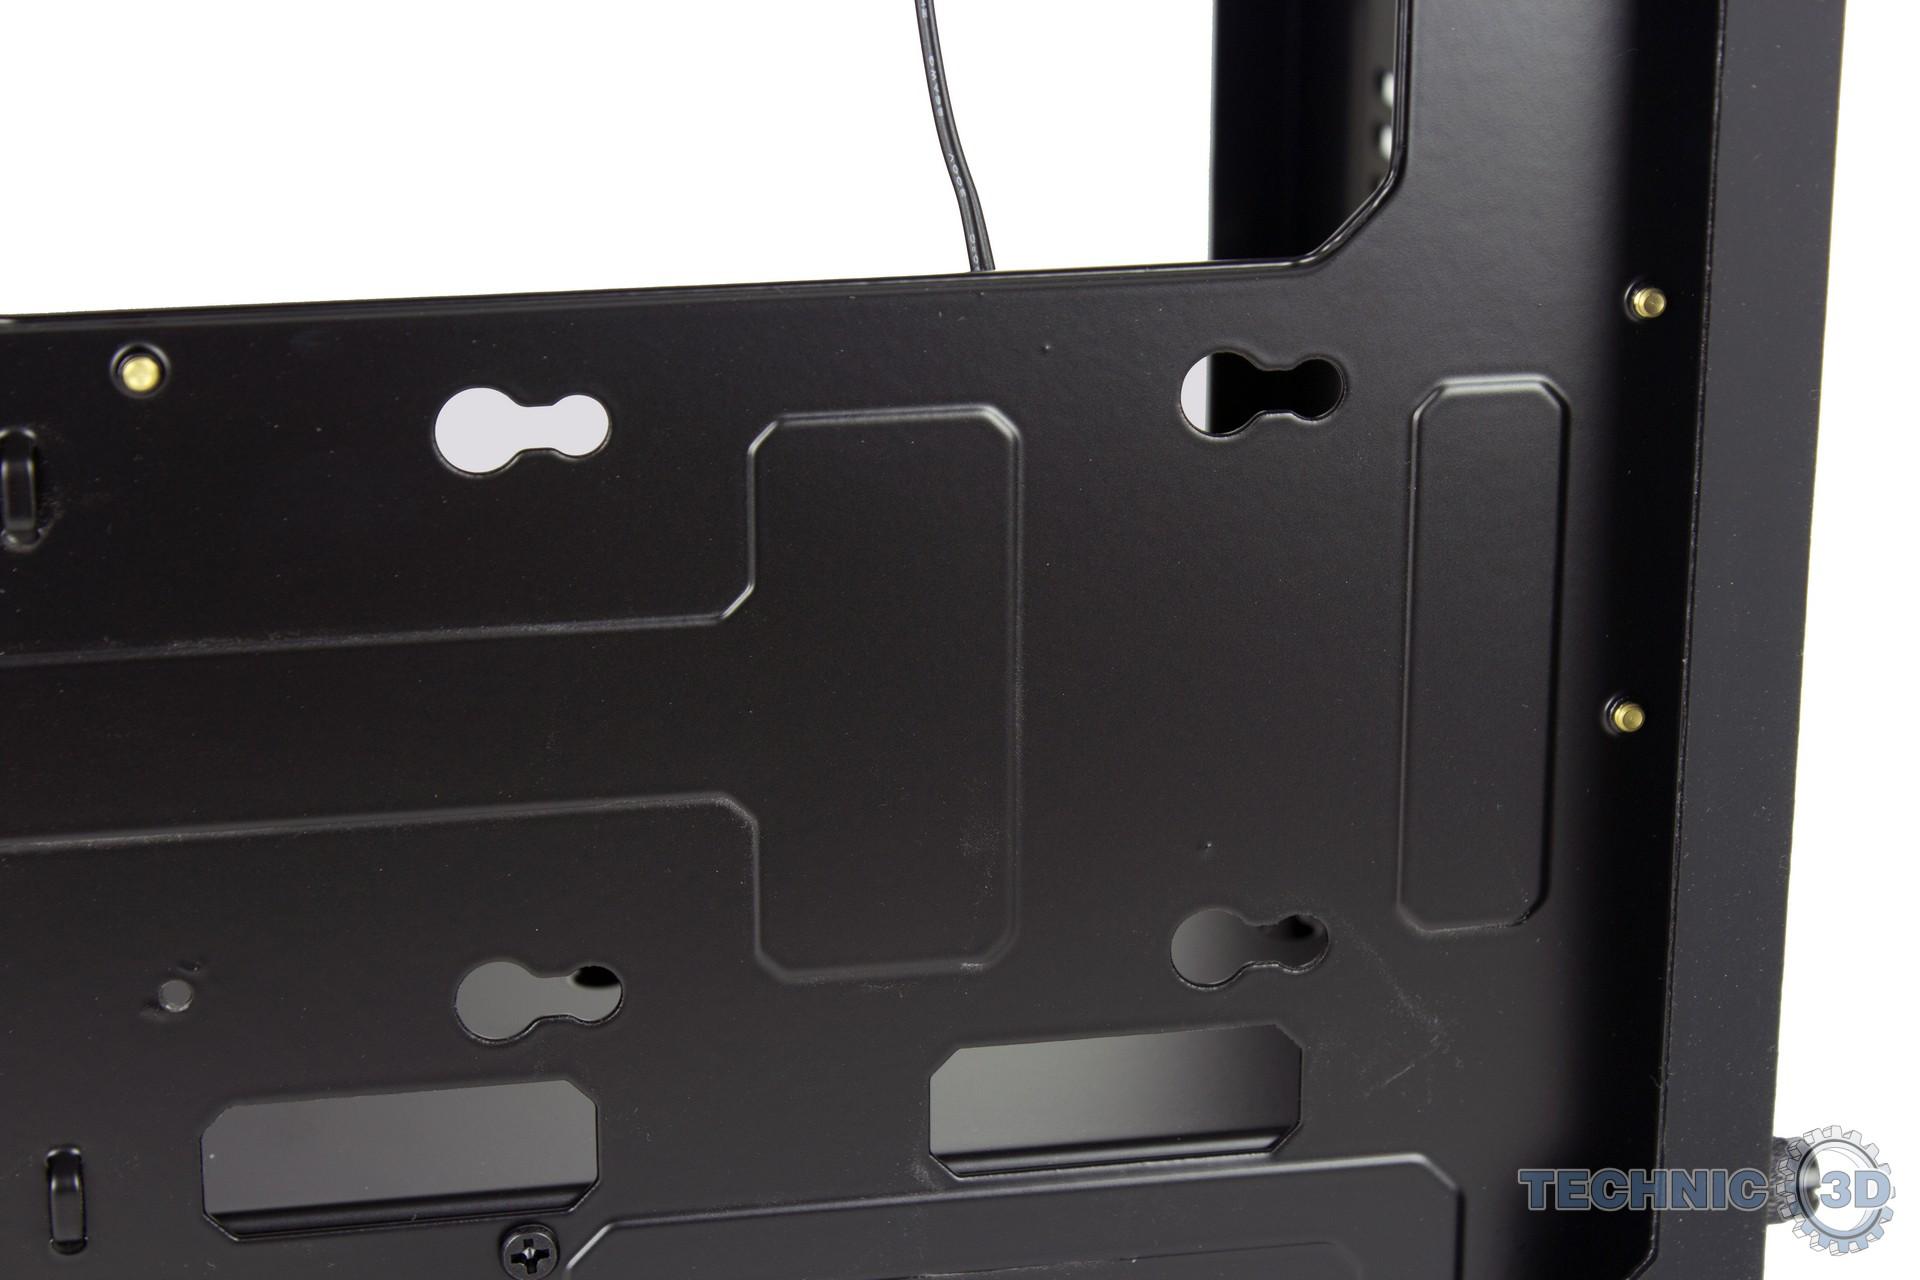 Jonsbo RM3 Gehäuse im Test - Seite 2 | Review | Technic3D